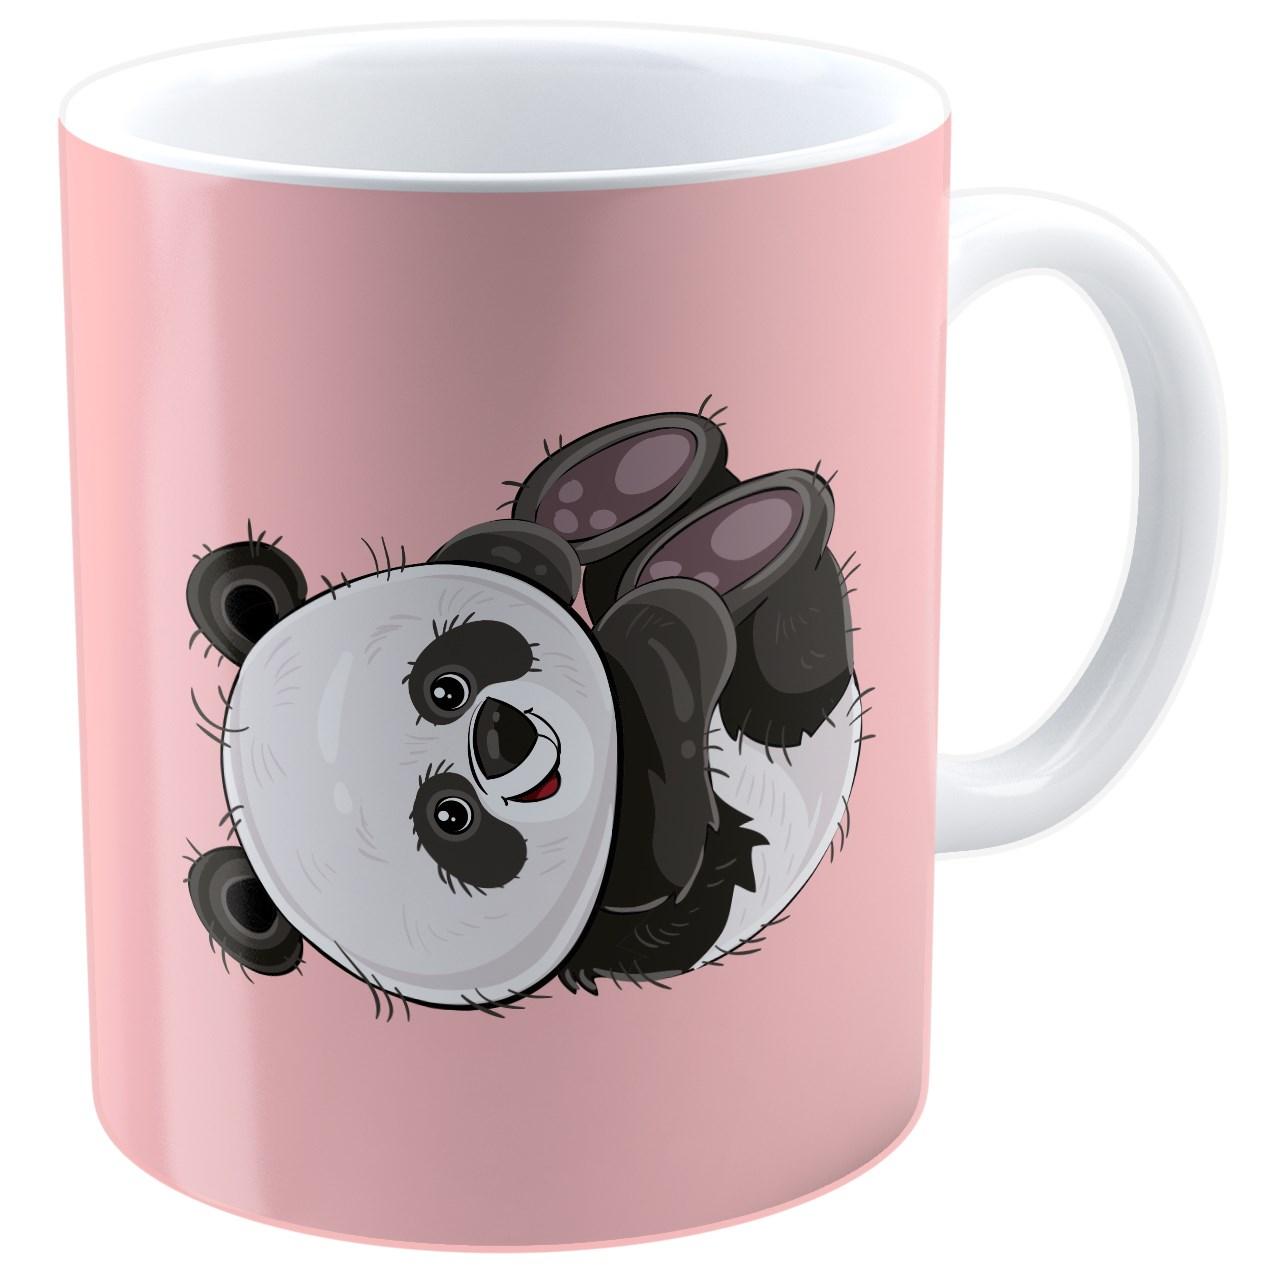 ماگ شین دیزاین طرح بچه پاندا - 4025